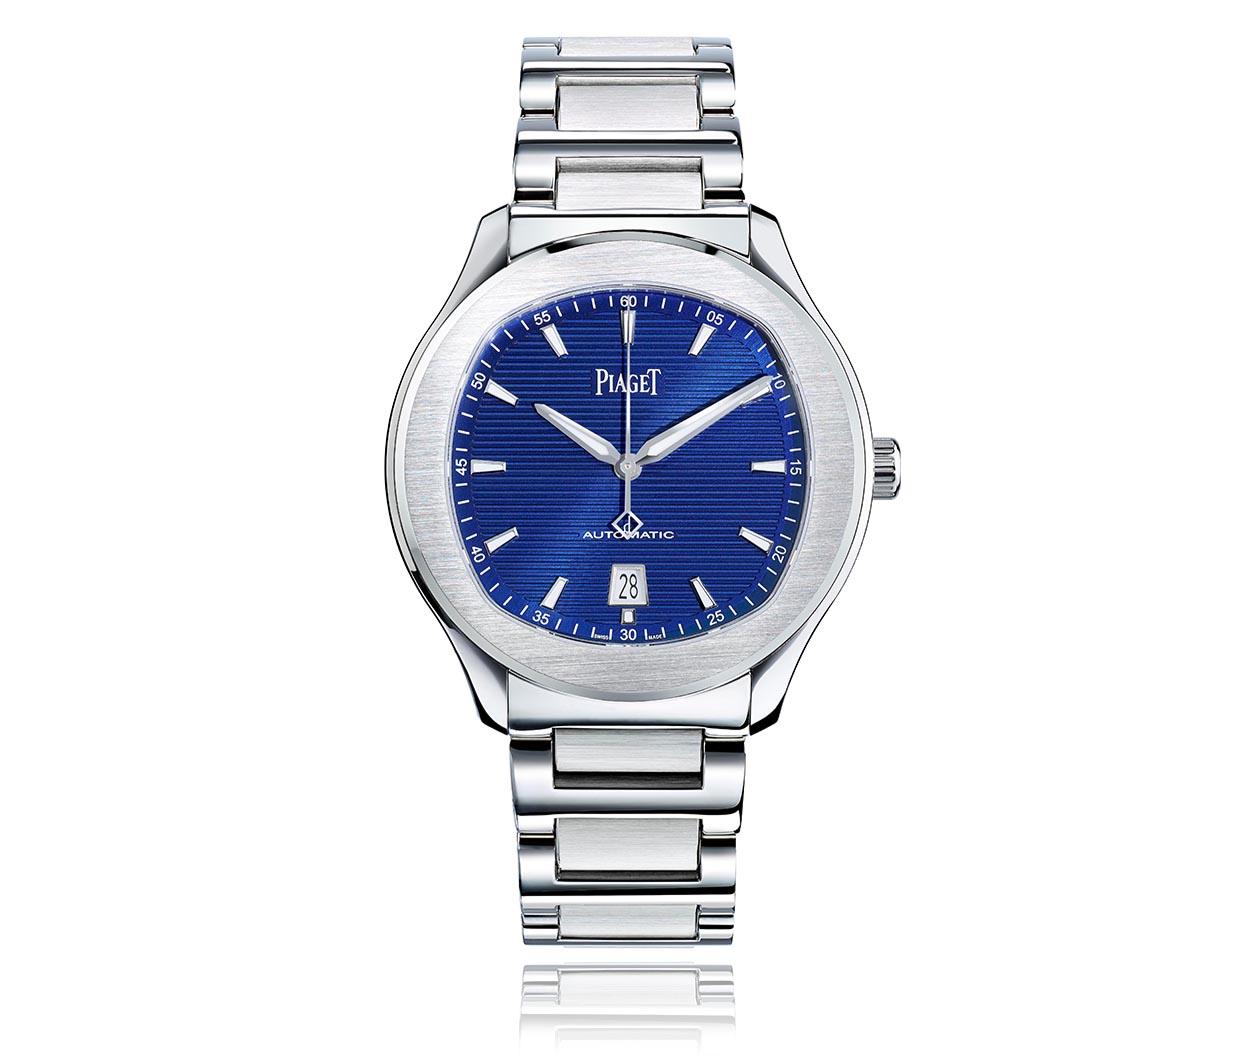 Piaget PoloS watch G0A41002 Carousel 1 FINAL